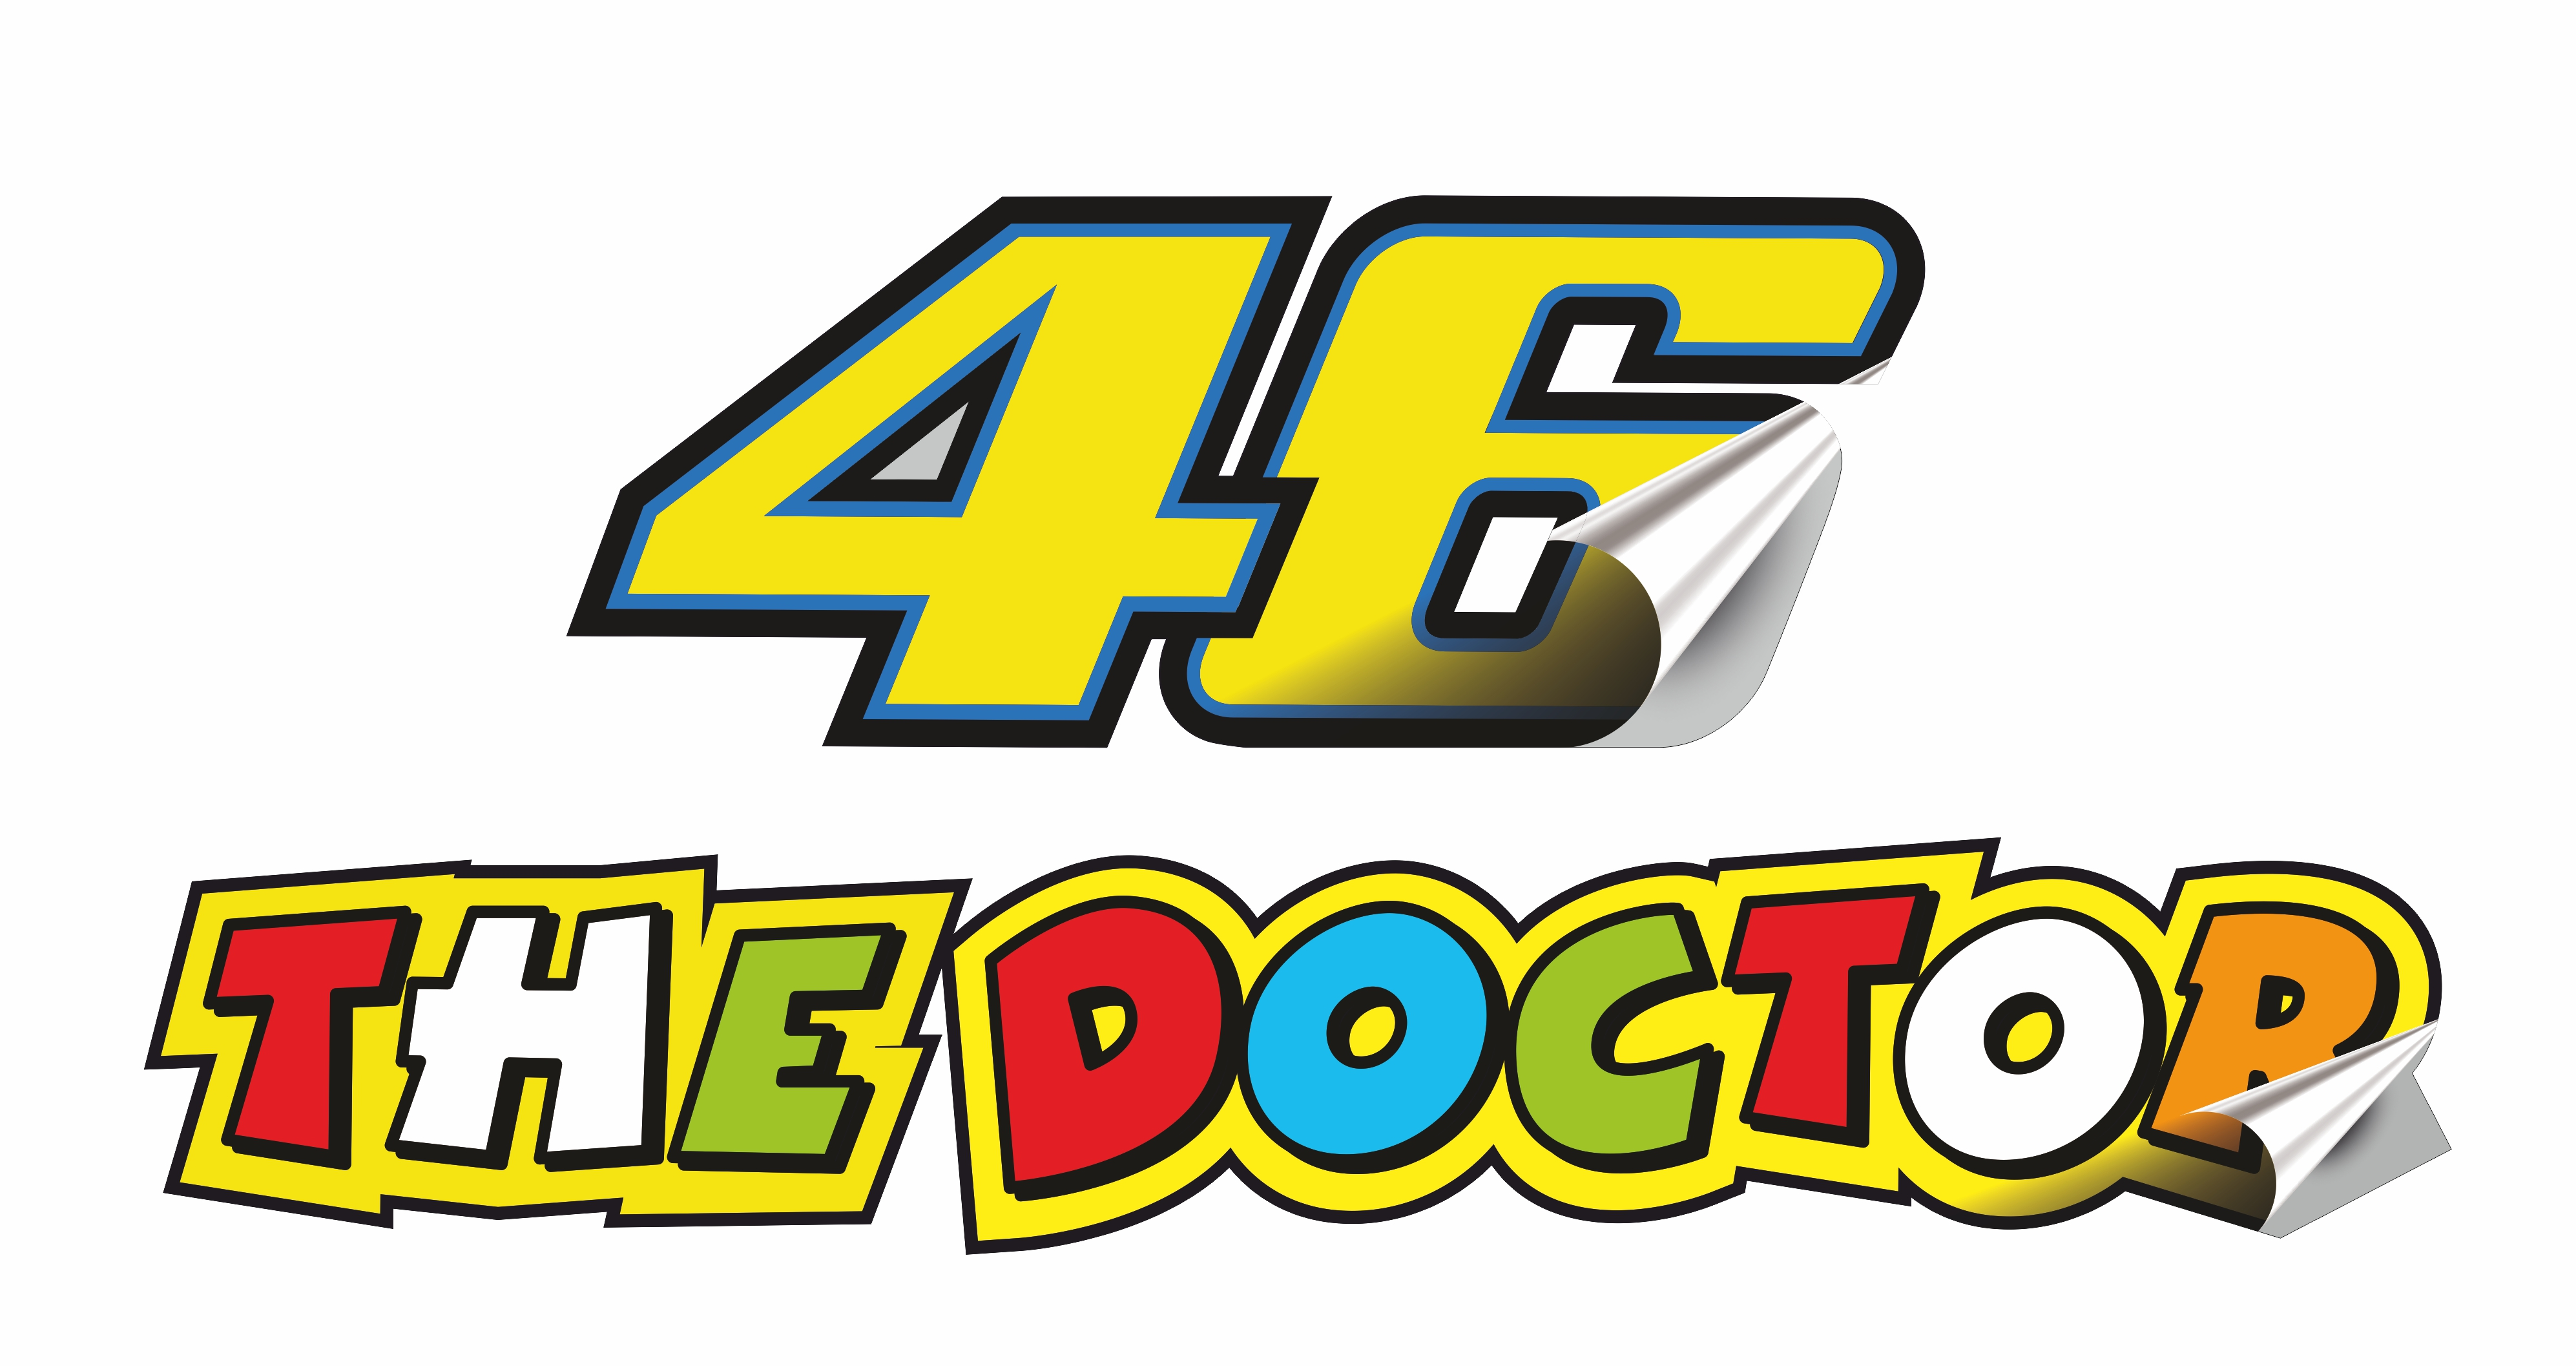 Valentino Rossi 46 The Doctor